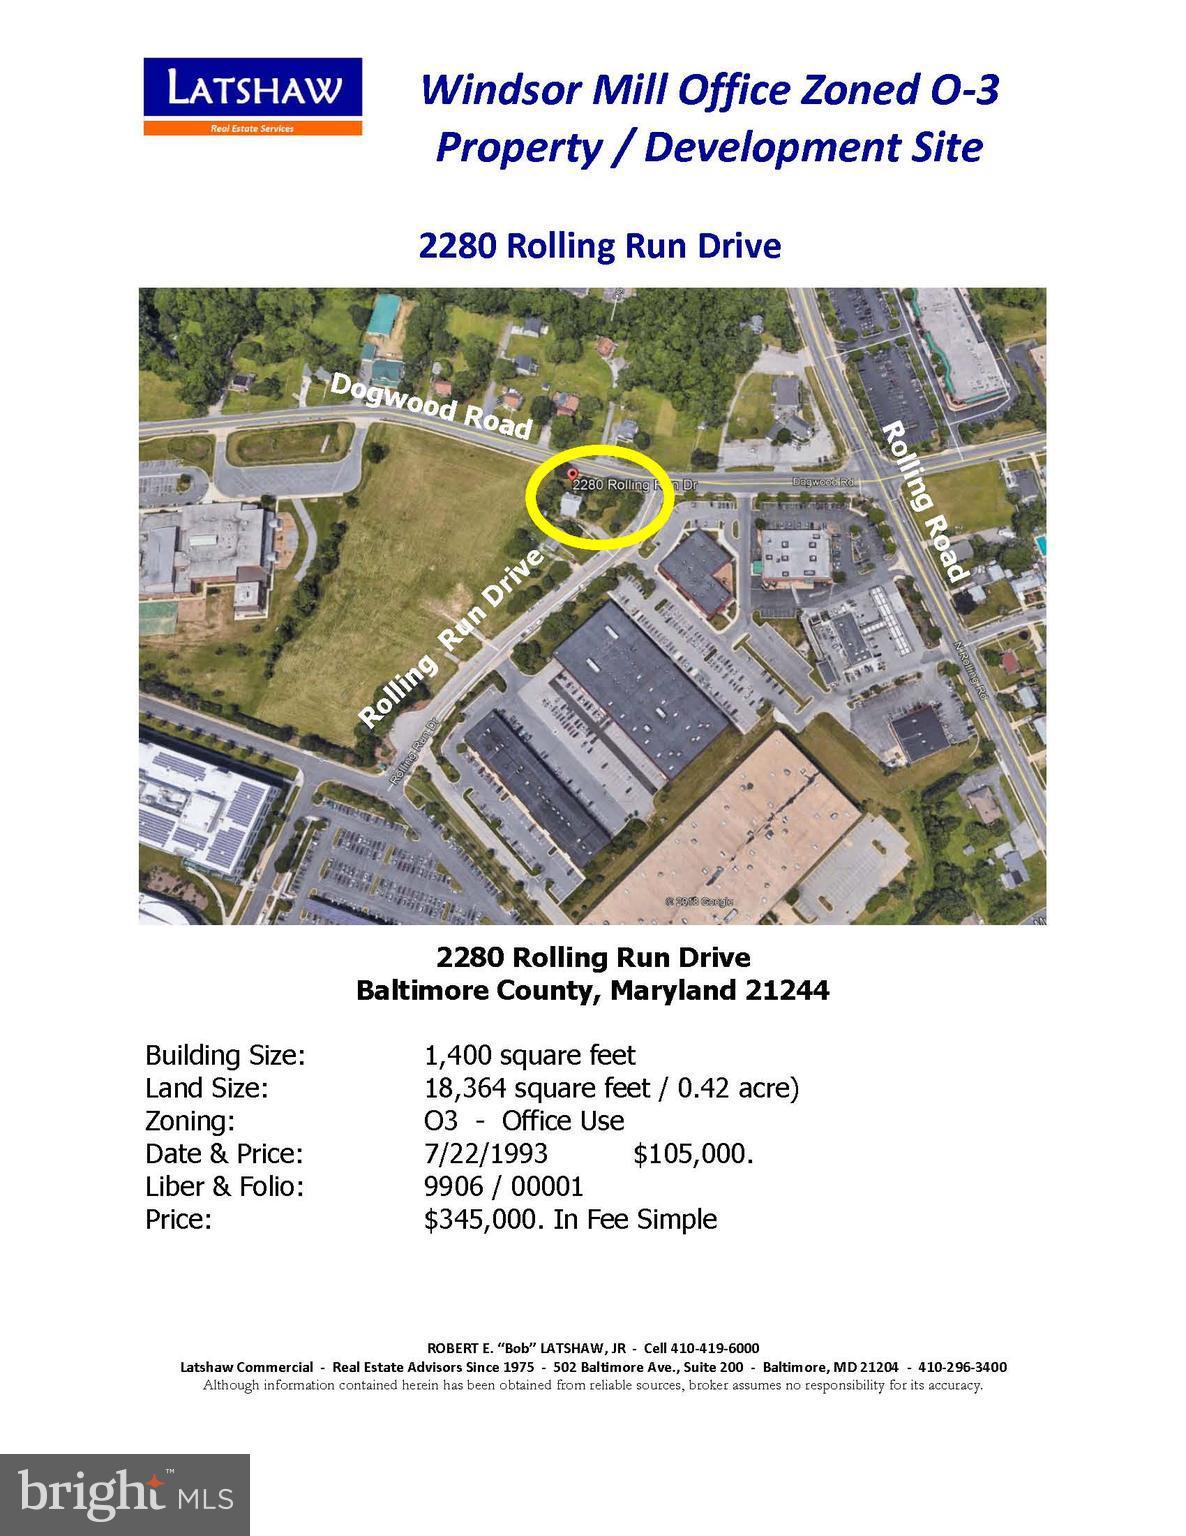 2280 ROLLING RUN DRIVE, BALTIMORE, MD 21244